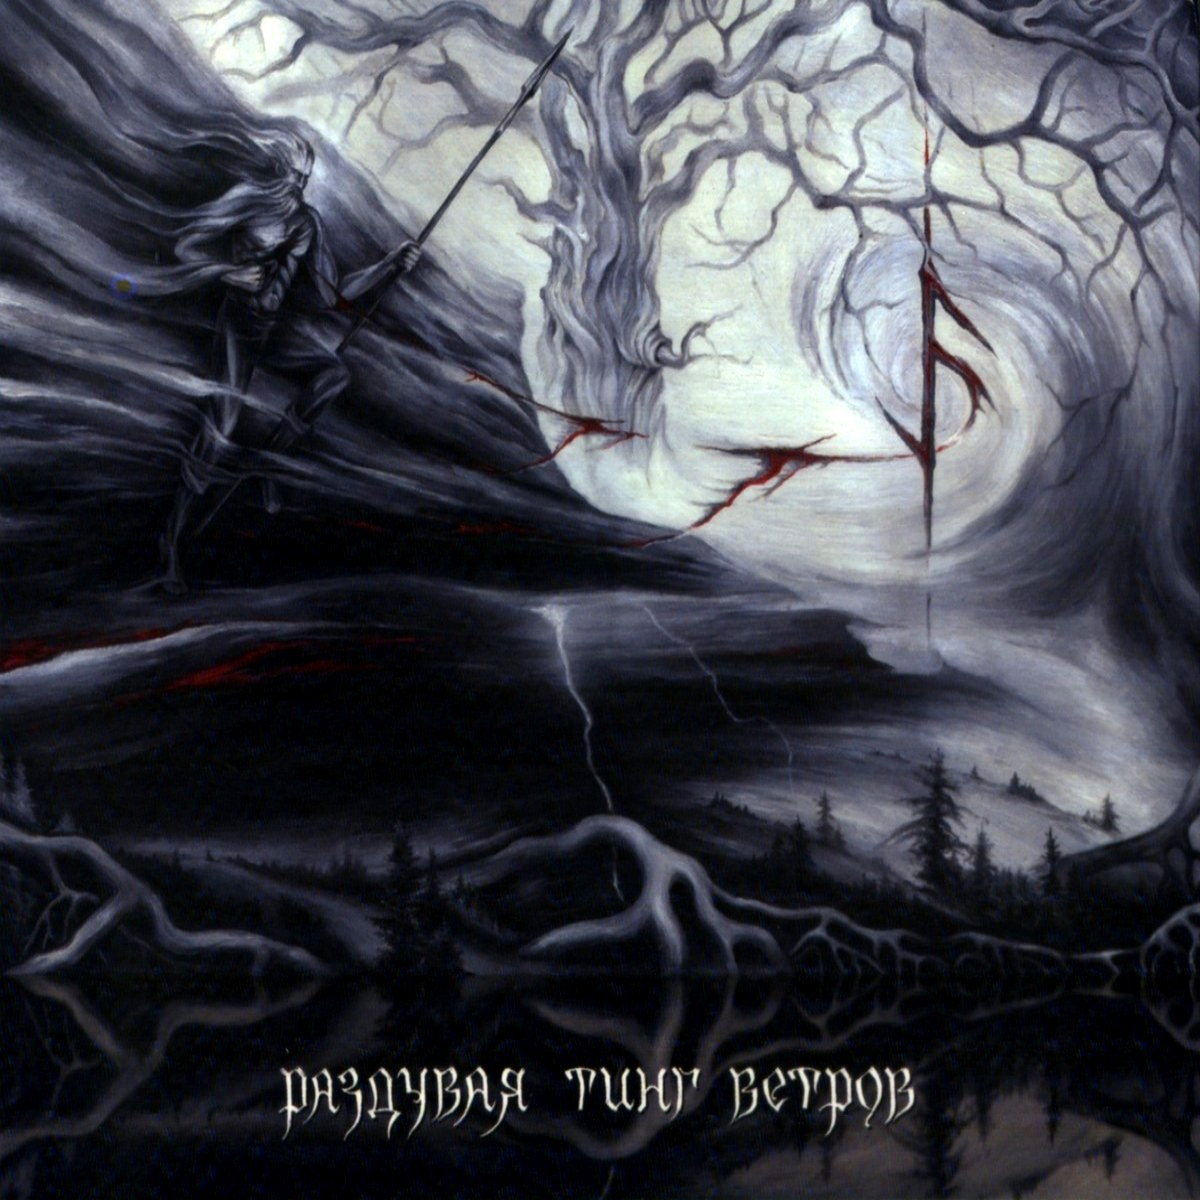 Review for Branikald - Раздувая Тинг Ветров